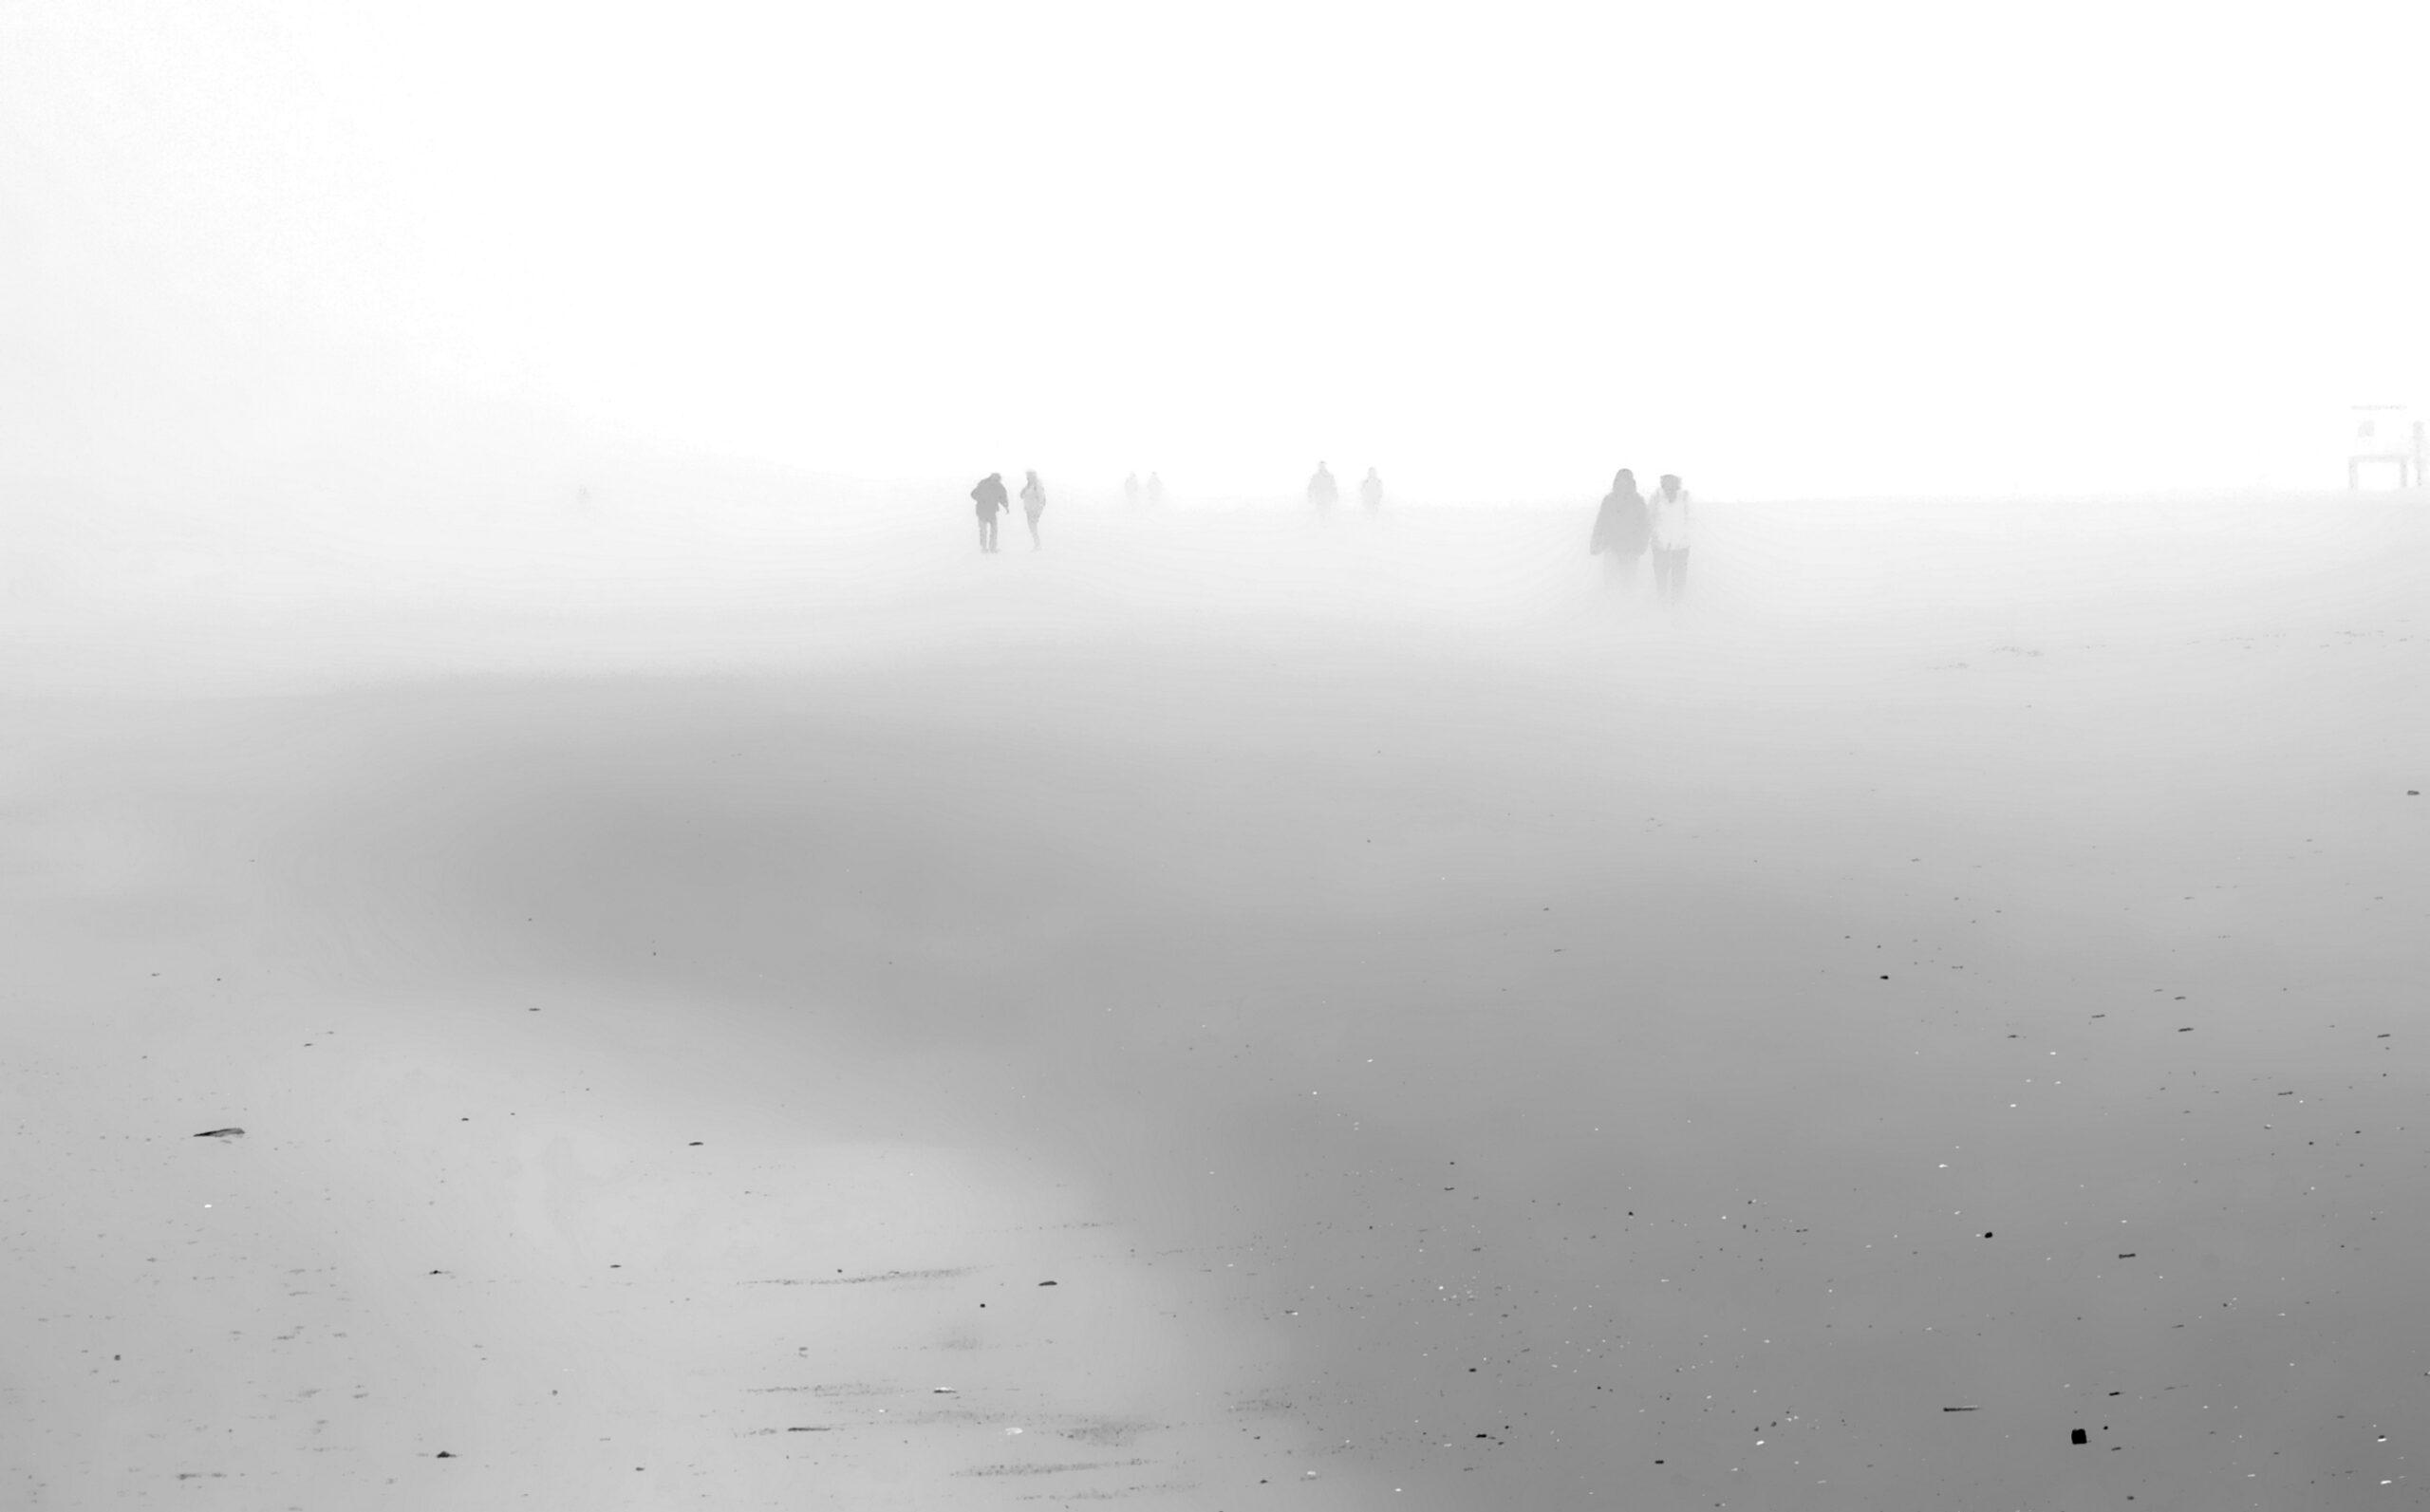 Nebel in Nebel